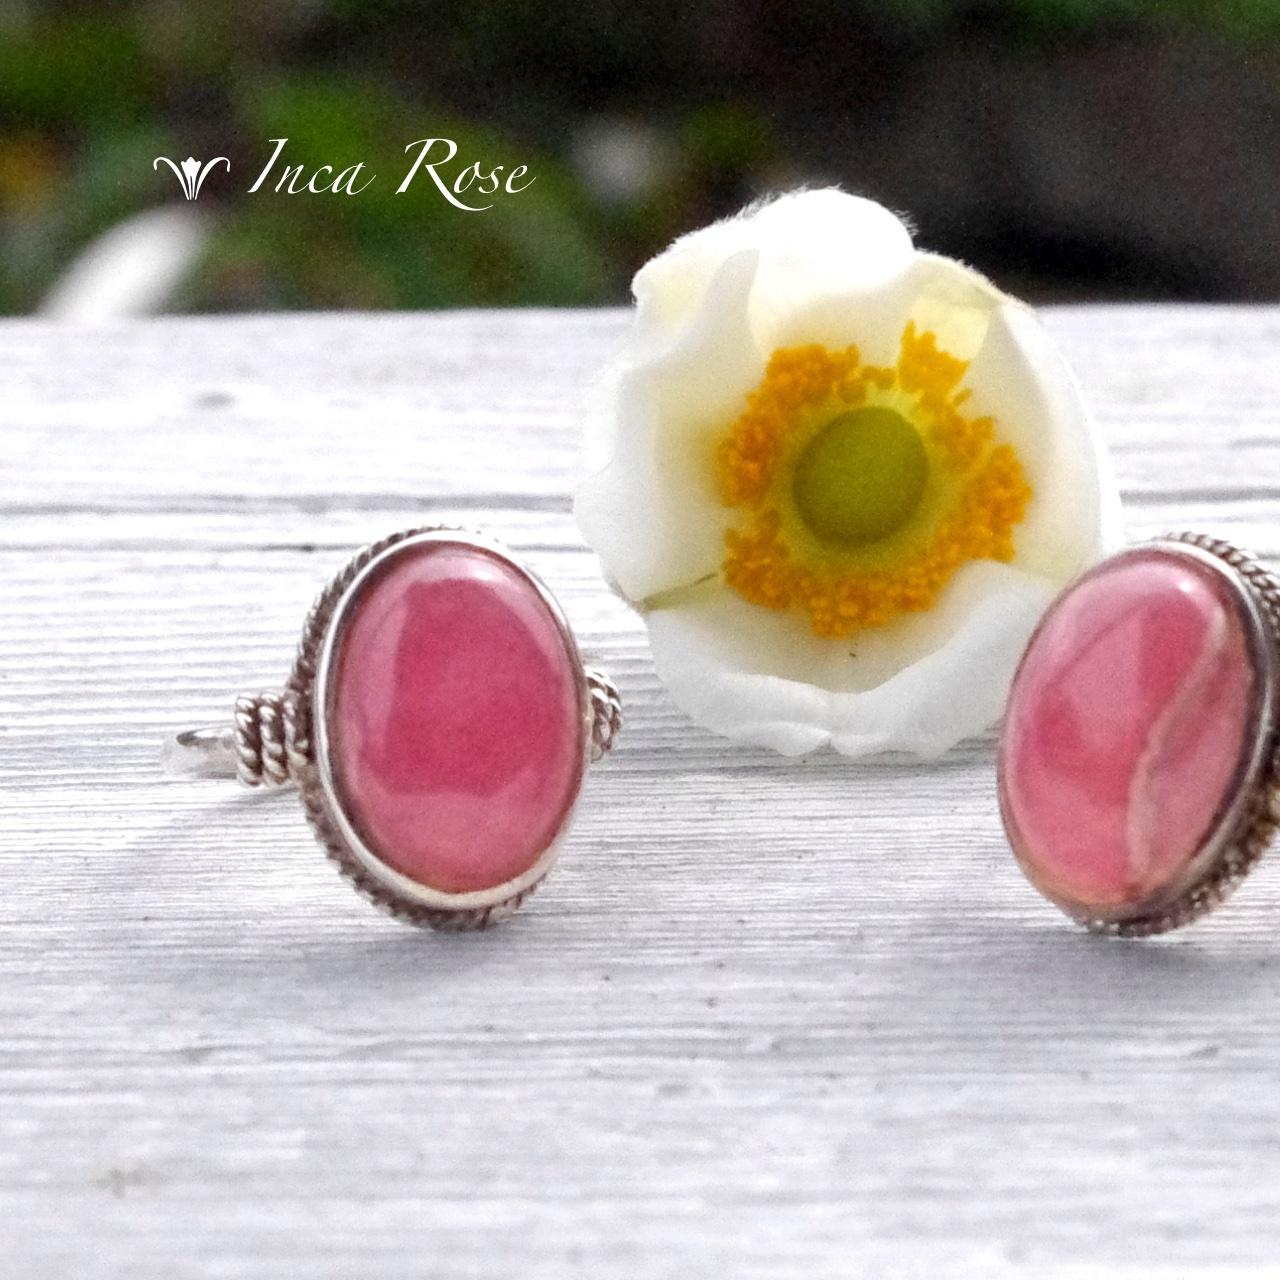 【SV925】*古代インカの薔薇色の真珠* インカローズ リング